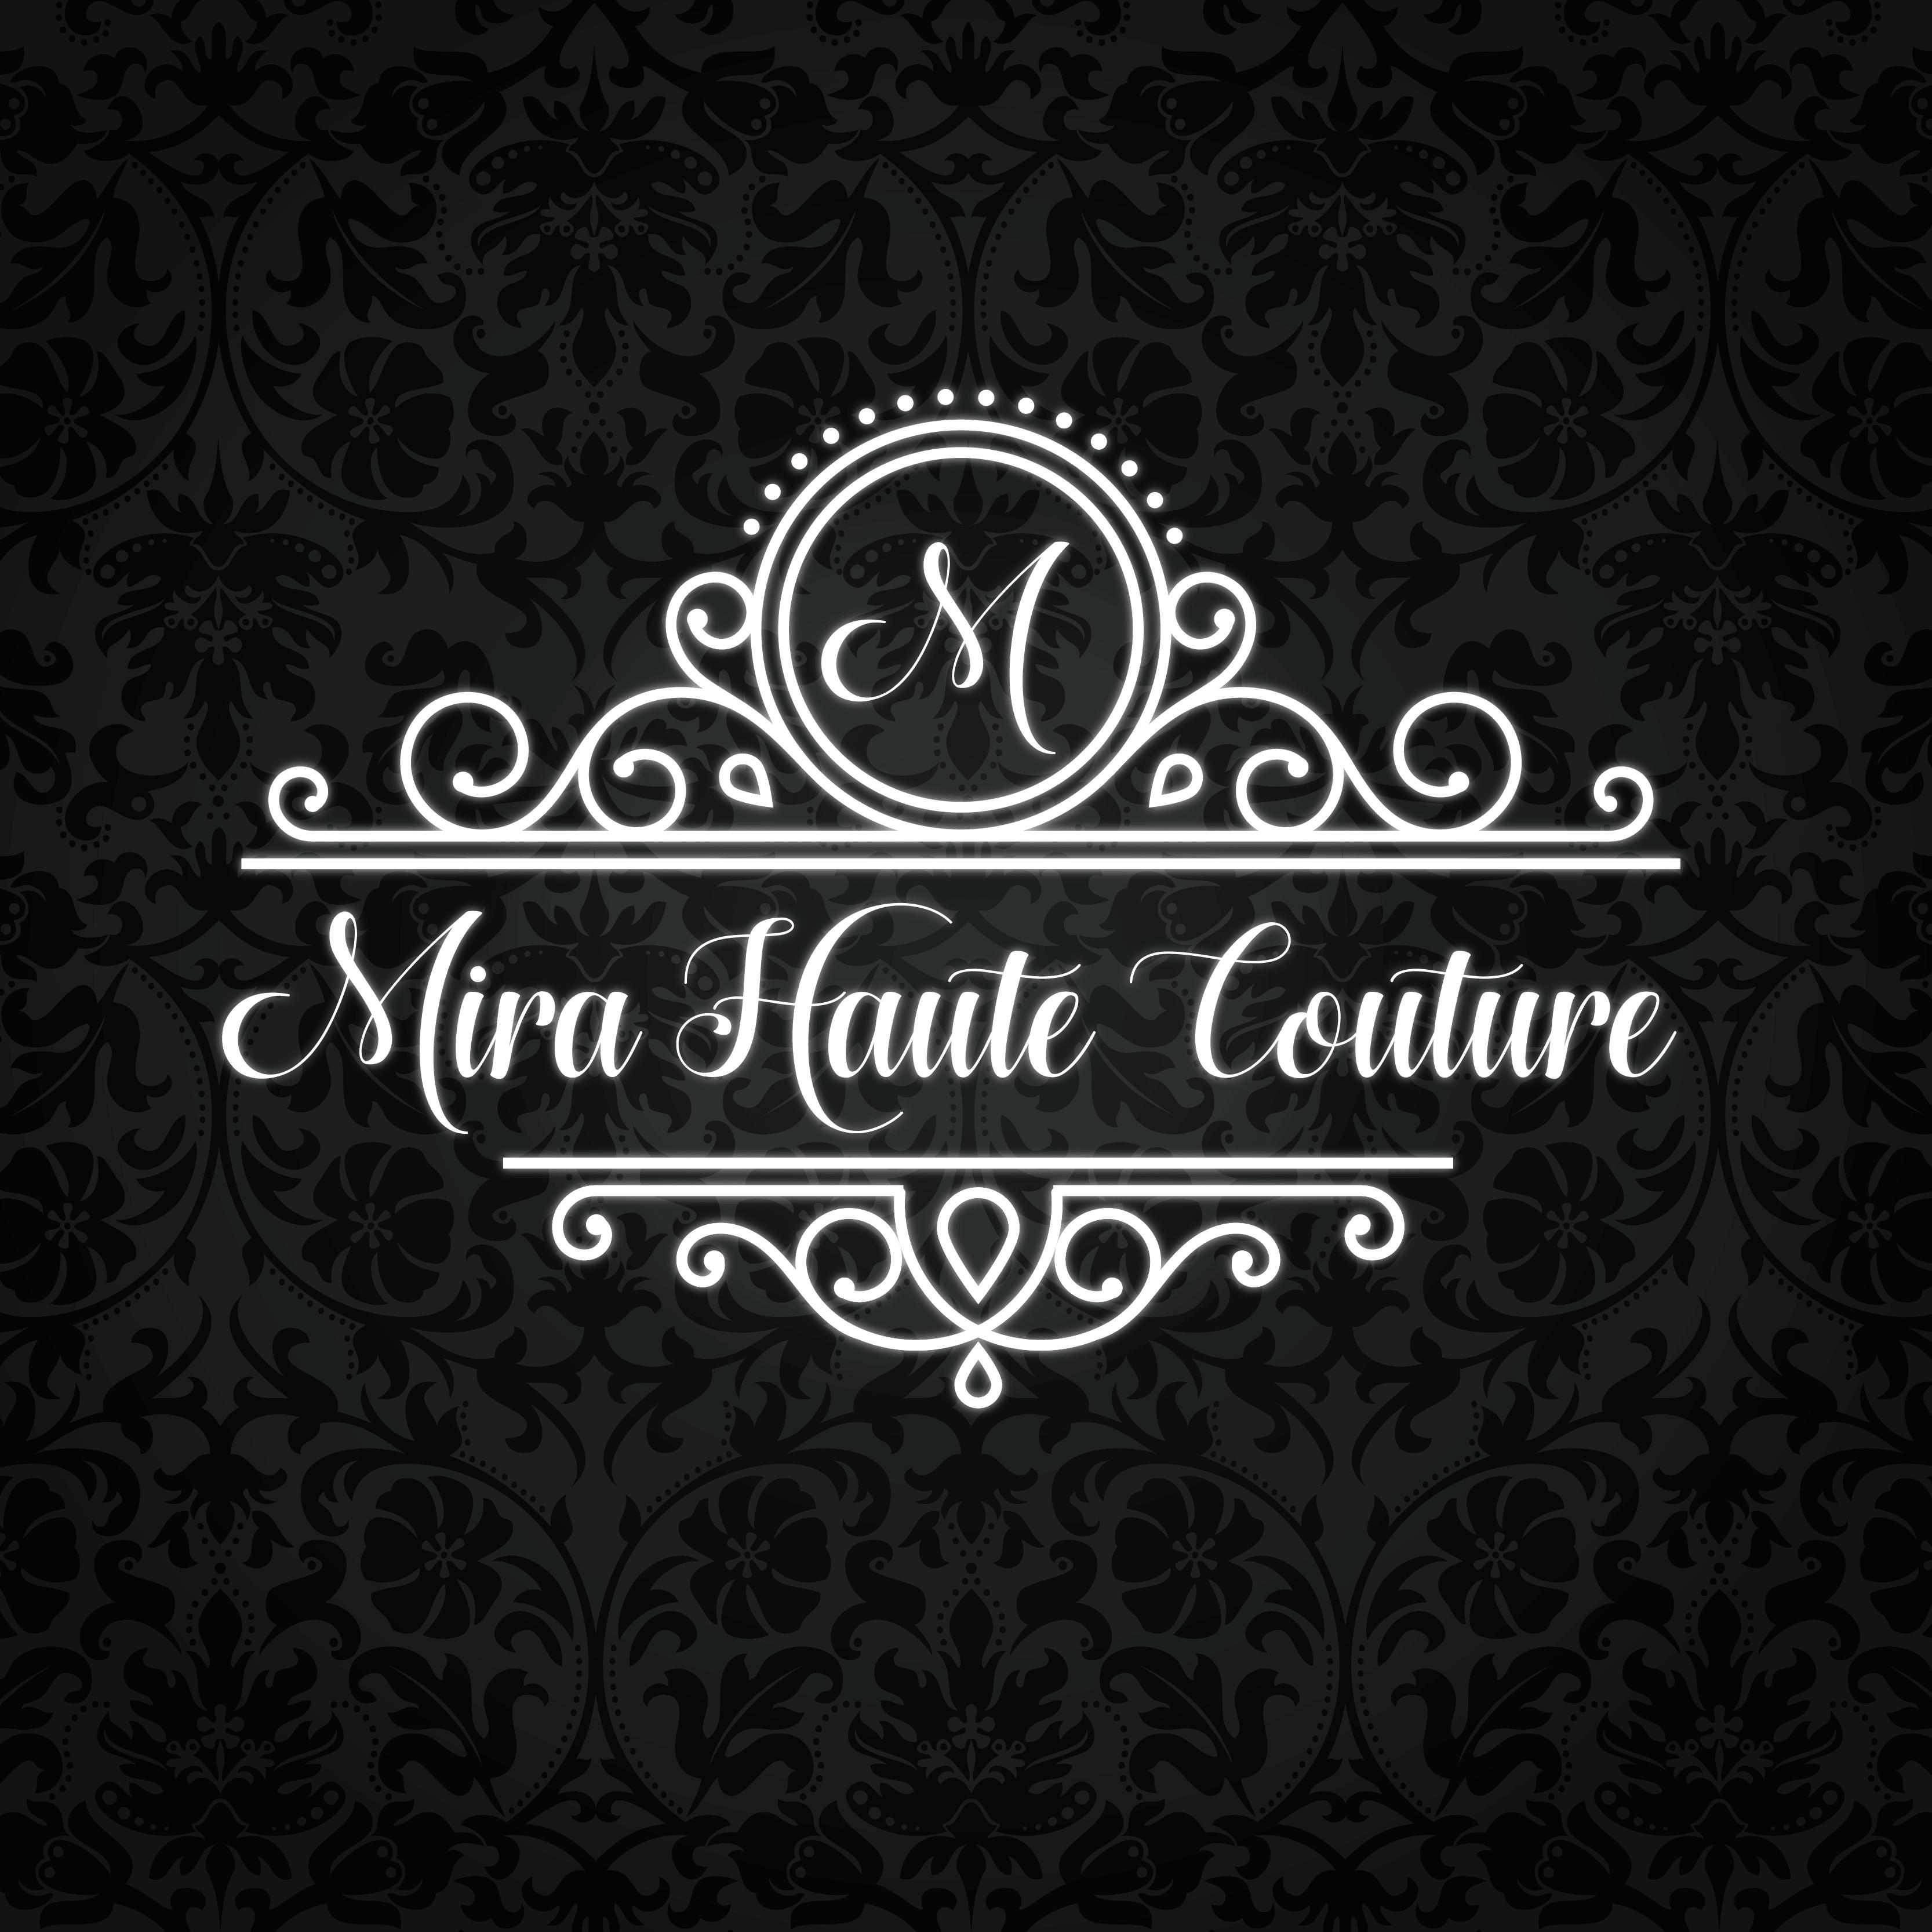 logo_mira haute couture_lorem